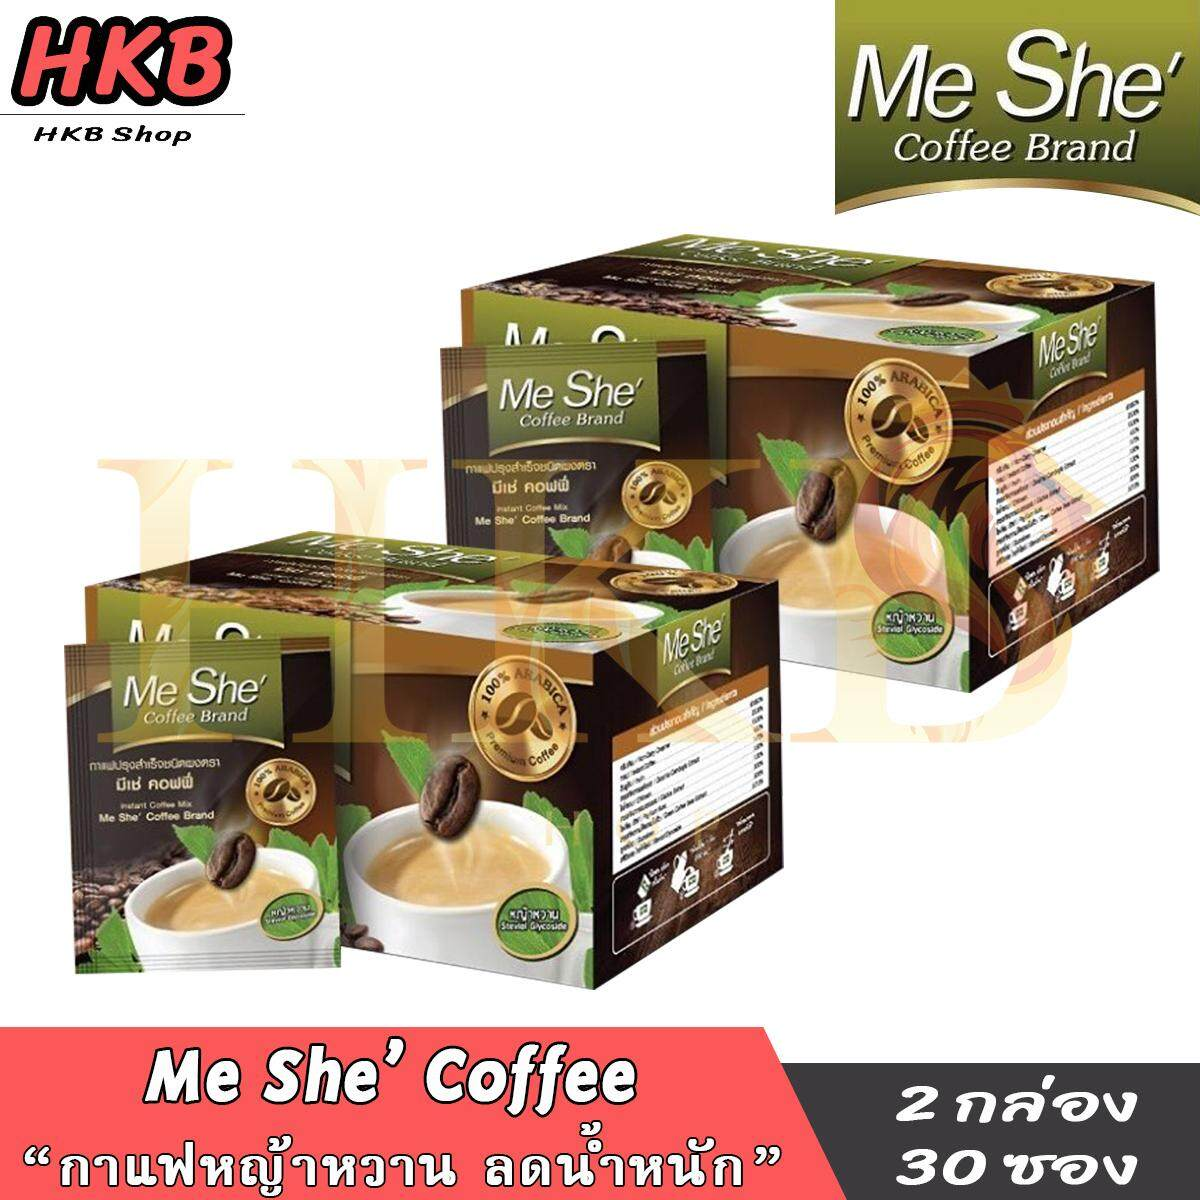 ⚡️2กล่อง/แท้/พร้อมส่ง⚡️ Me She Coffee มีเช่ ค็อฟฟี่ กาแฟหญ้าหวาน ลดน้ำหนัก.